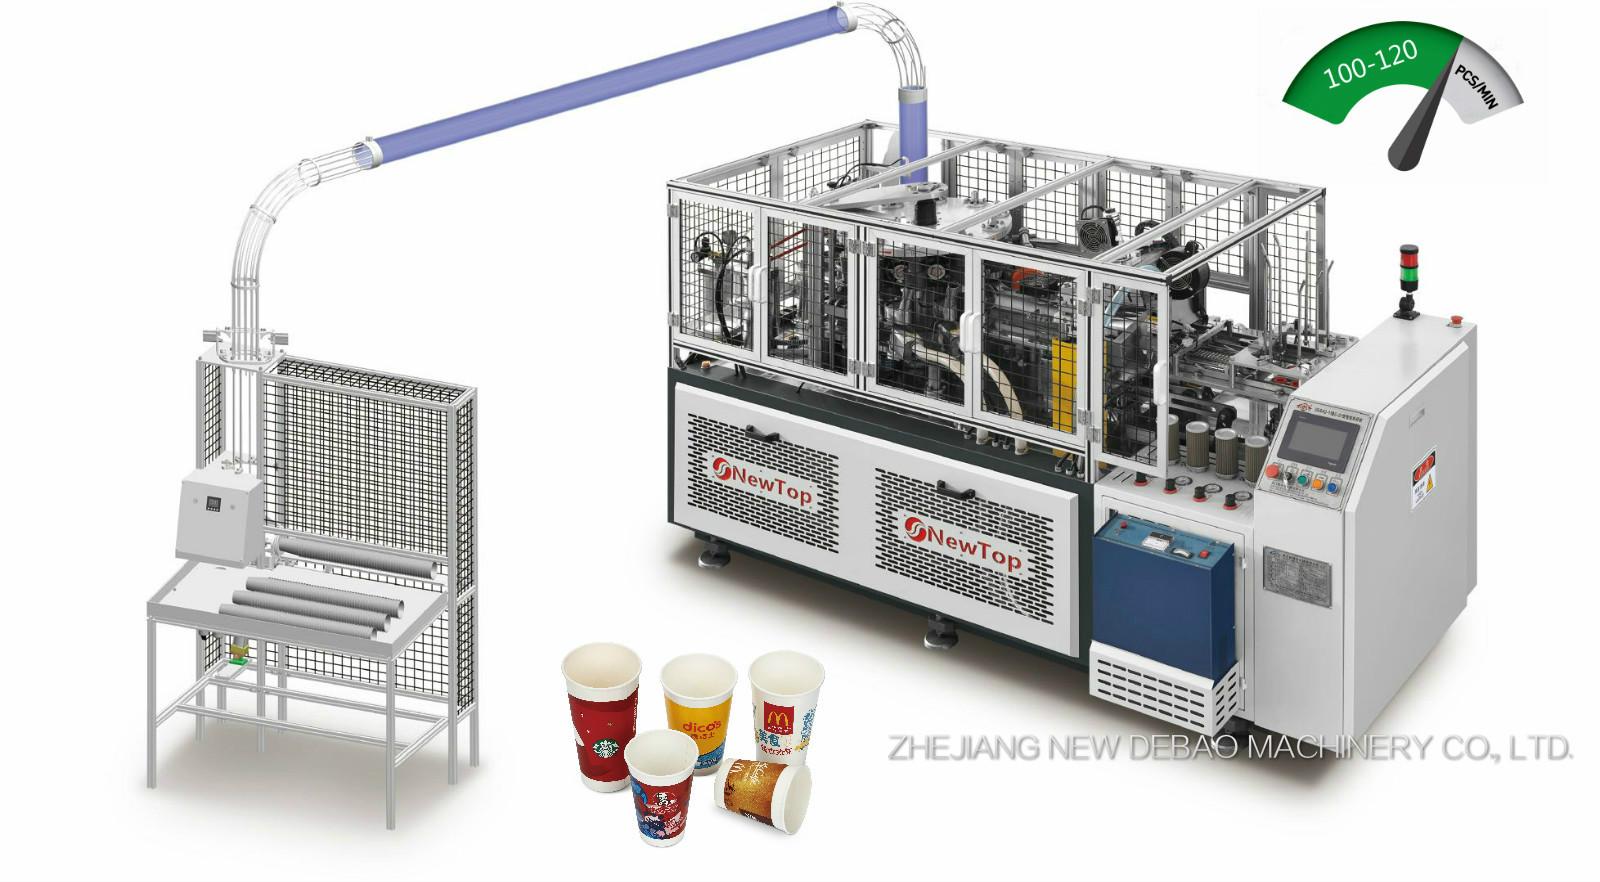 New Debao Machinery Array image72